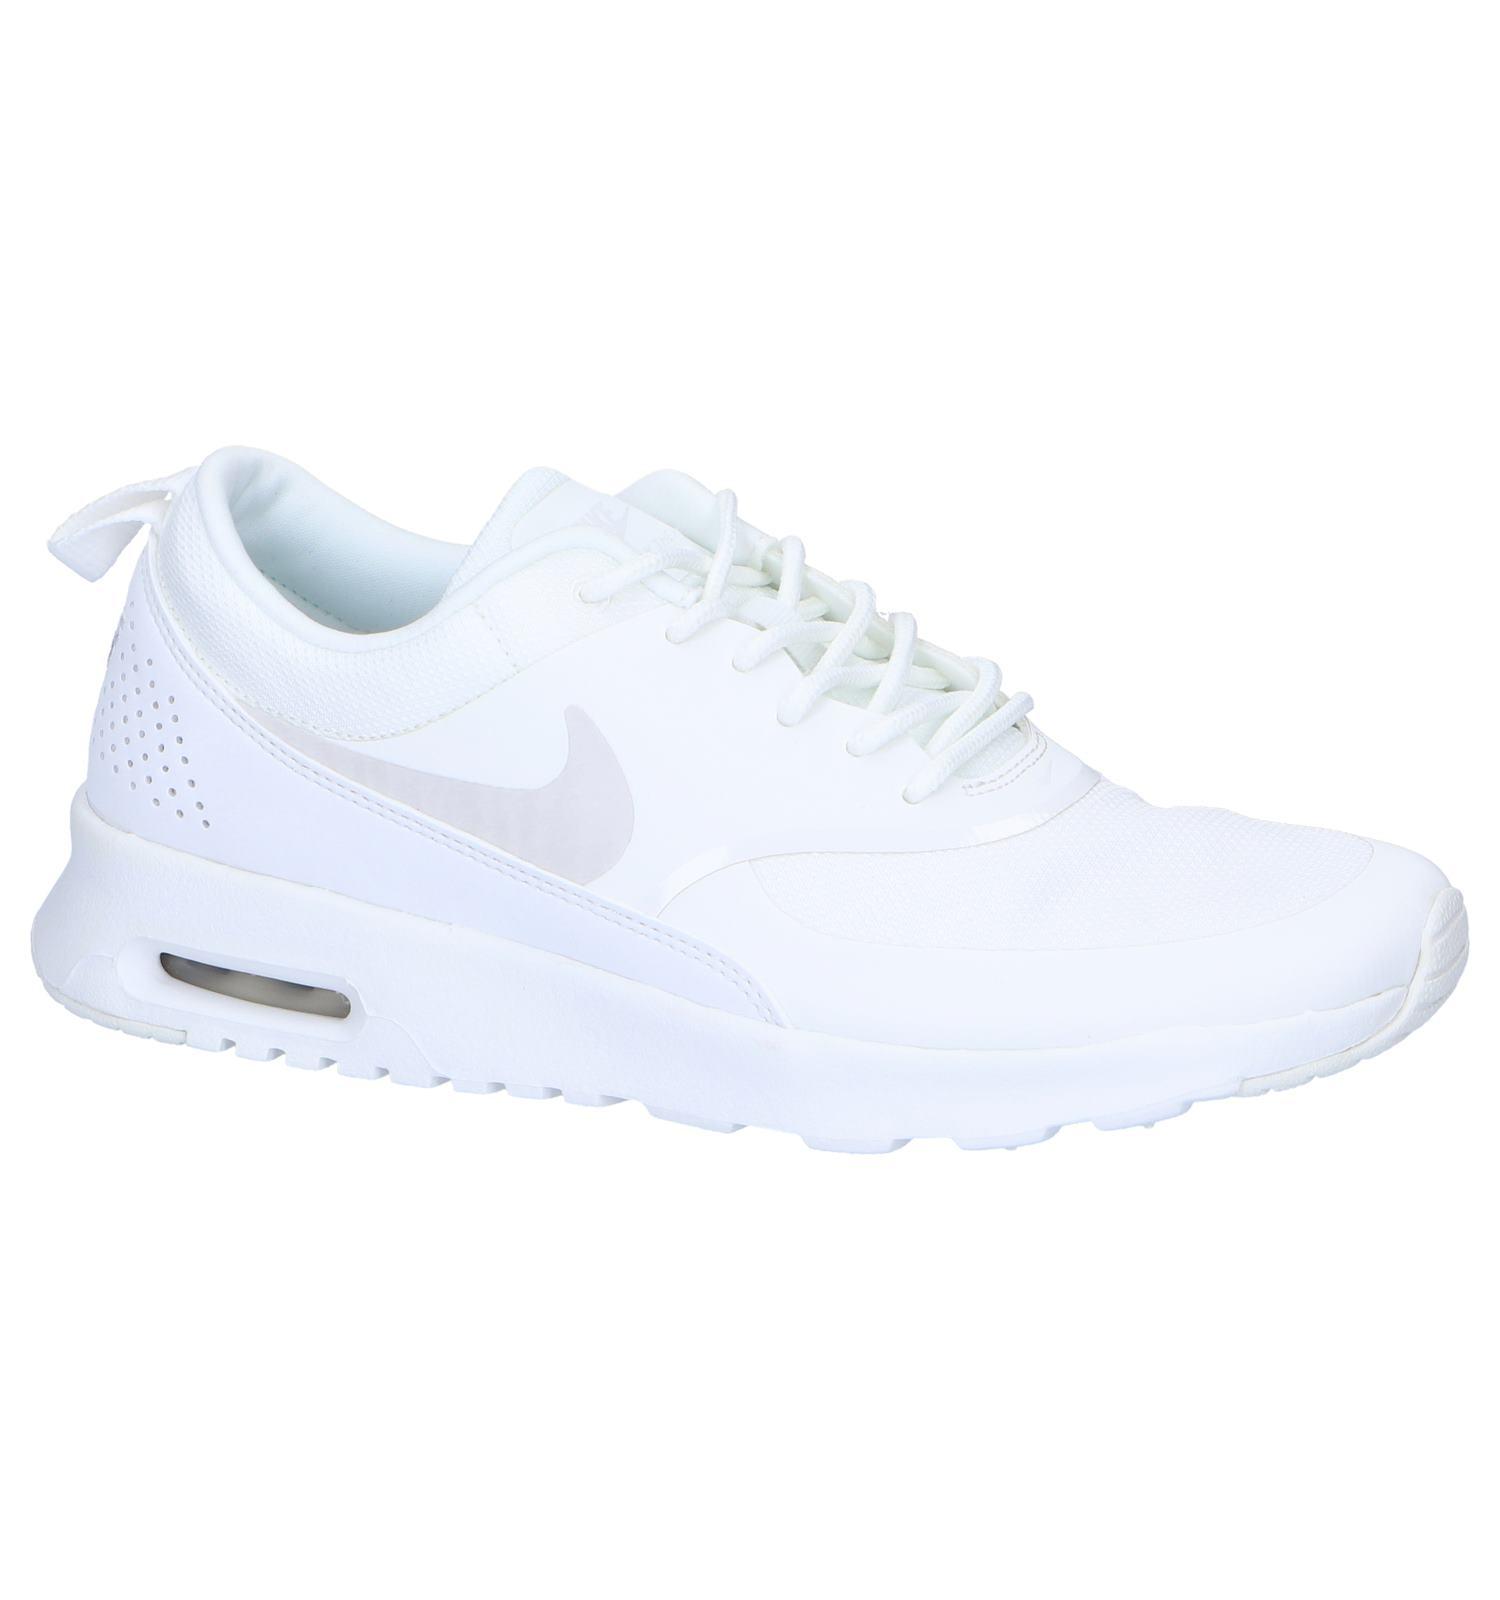 Witte Sneakers Nike Air Max Thea | SCHOENENTORFS.NL | Gratis verzend en  retour